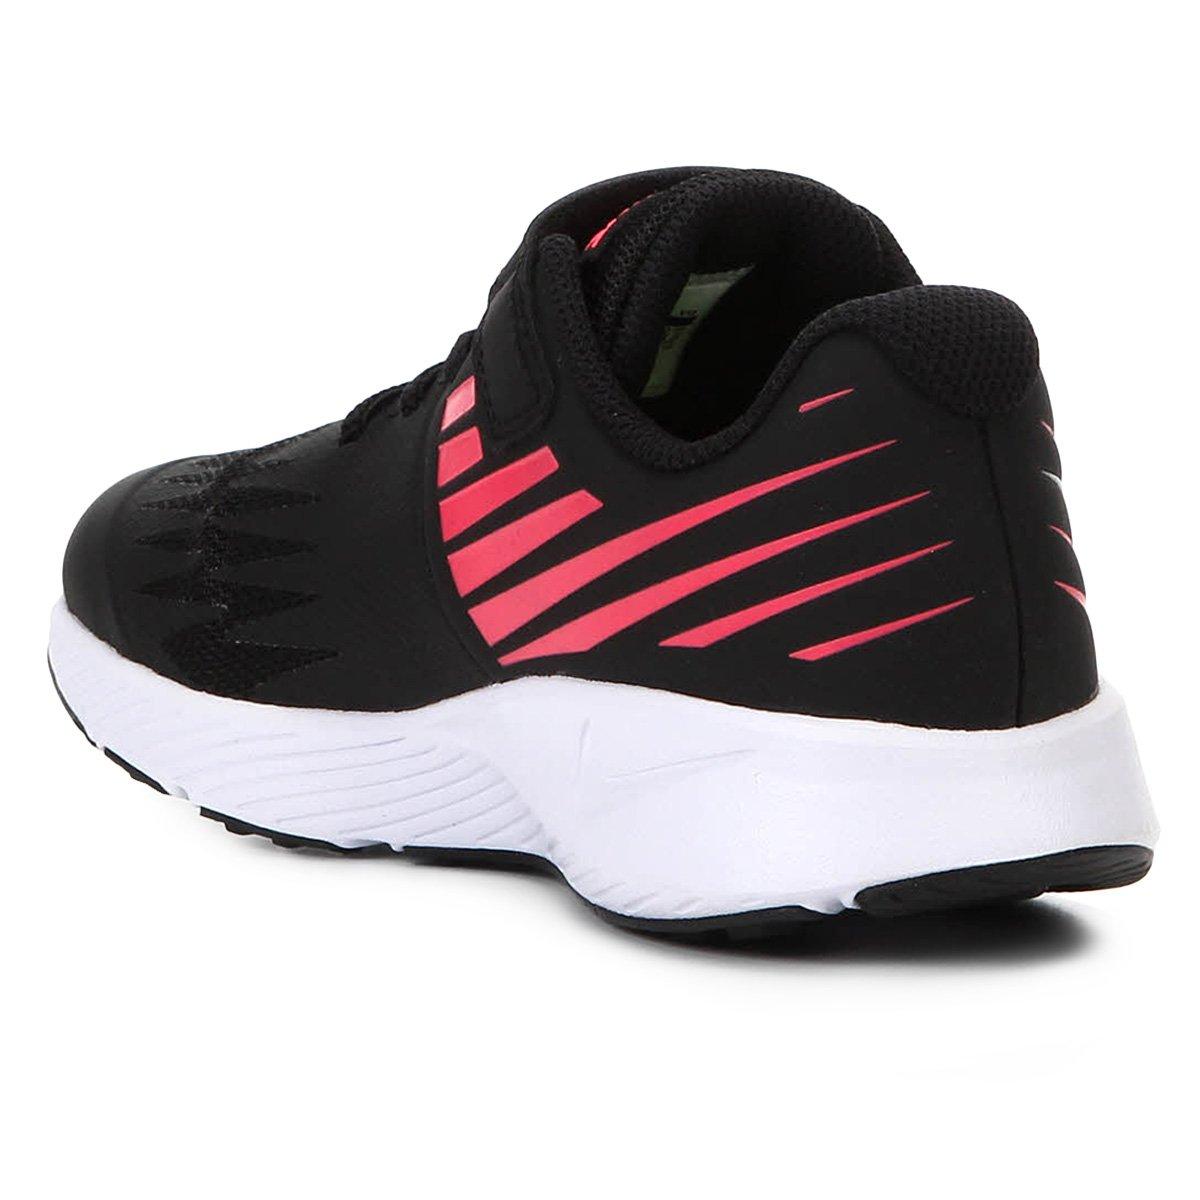 2caaea7bee Tênis Infantil Nike Star Runner Feminino - Preto e Rosa - Compre ...